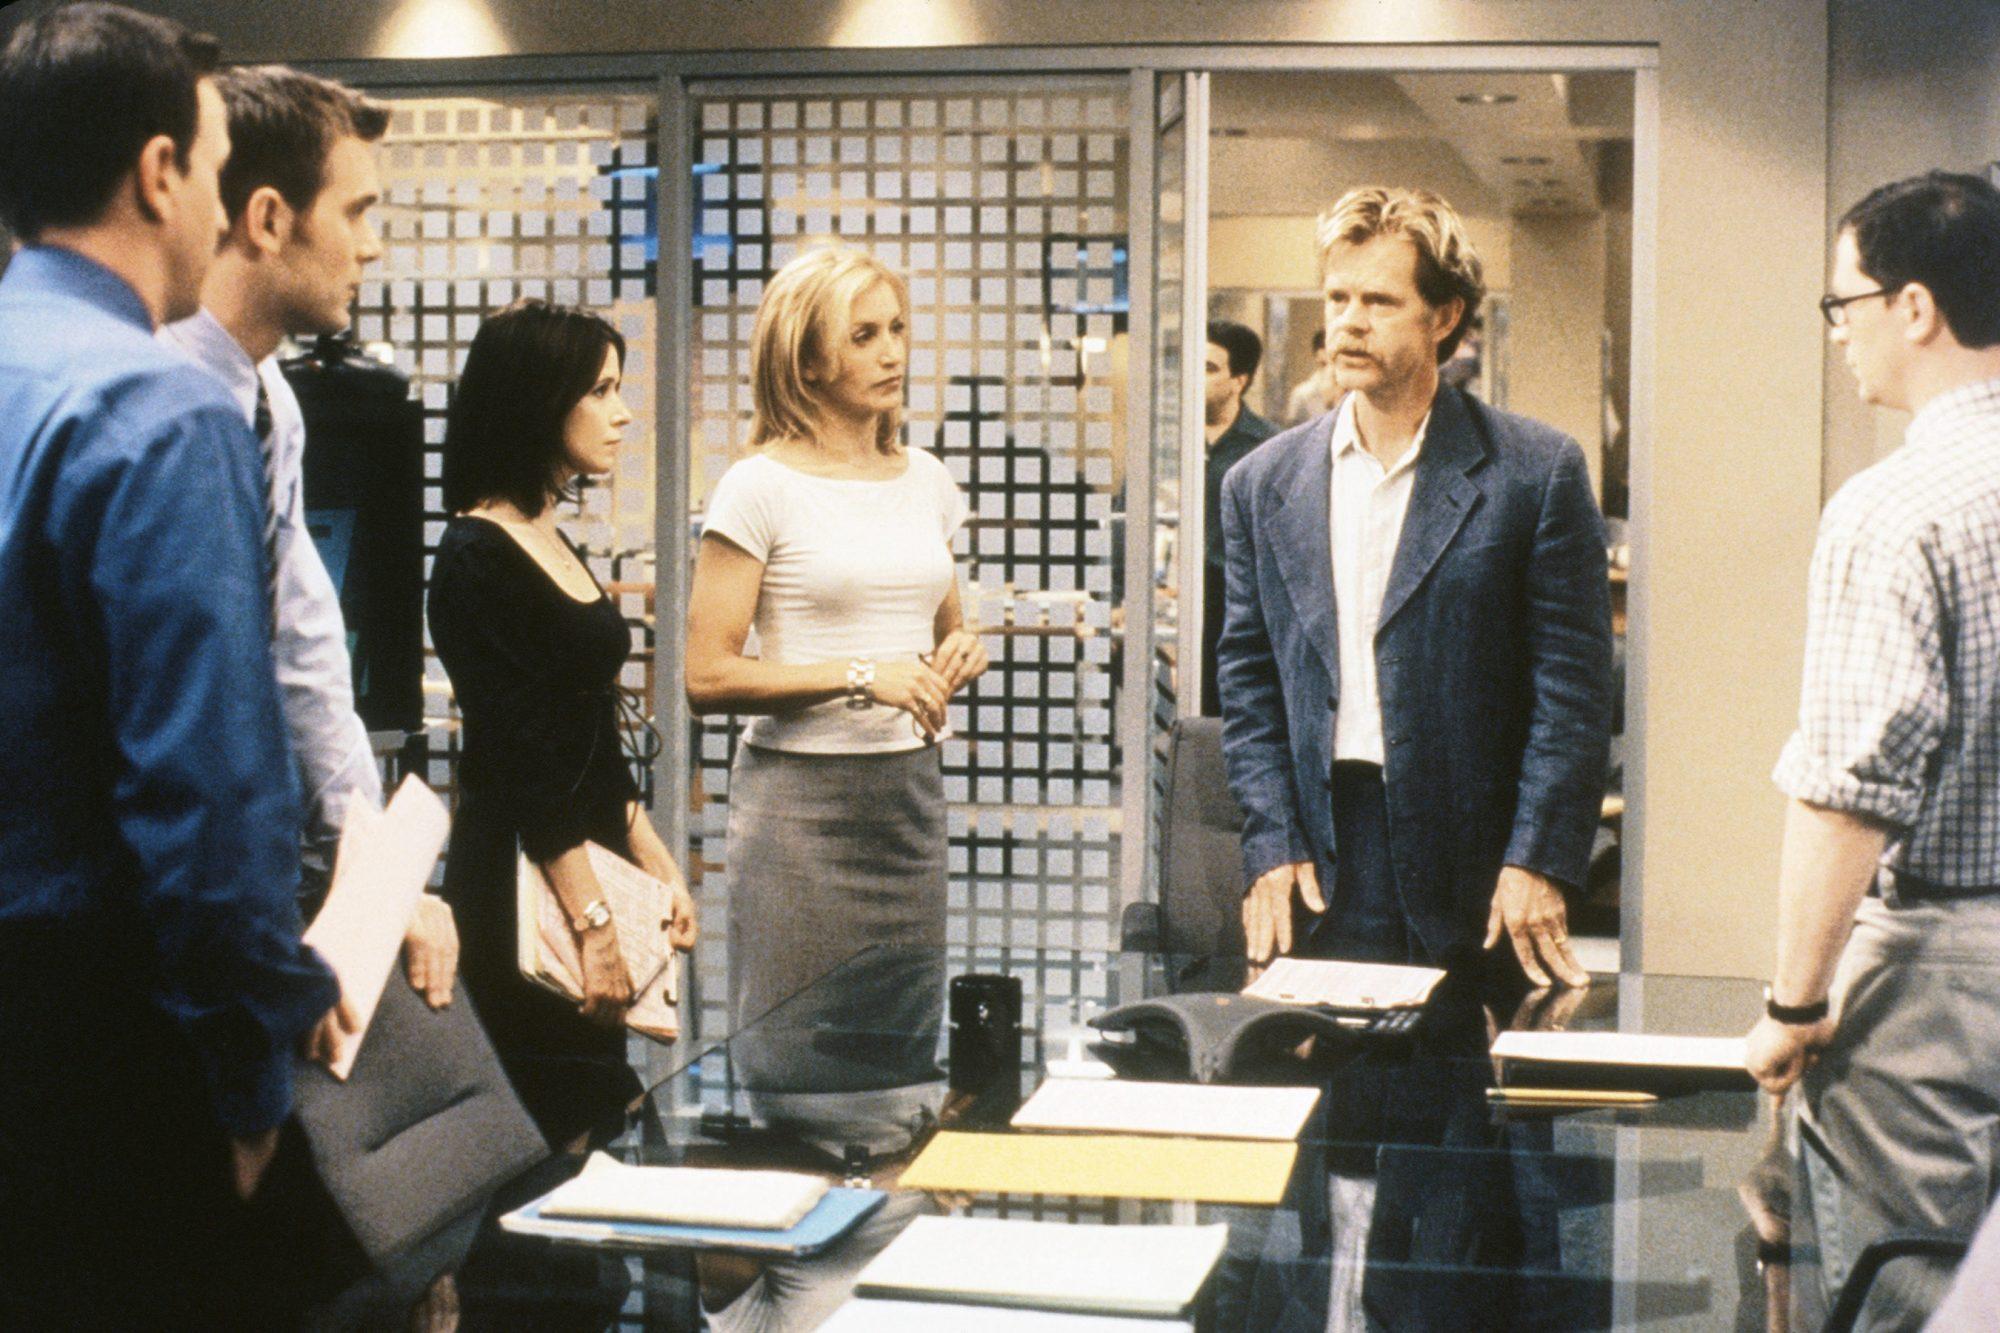 SPORTS NIGHT, (from left): Josh Charles, Peter Krause, Sabrina Lloyd, Felicity Huffman, William H. M